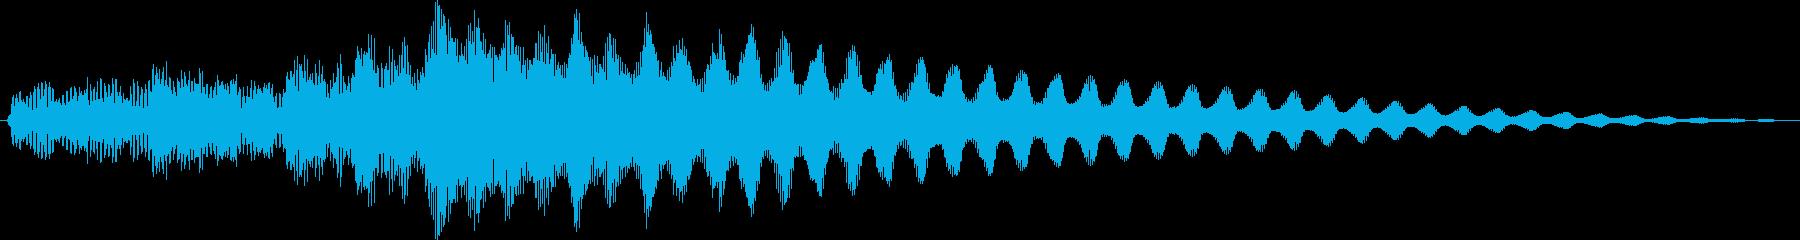 Vibraphone:卑劣なミステ...の再生済みの波形